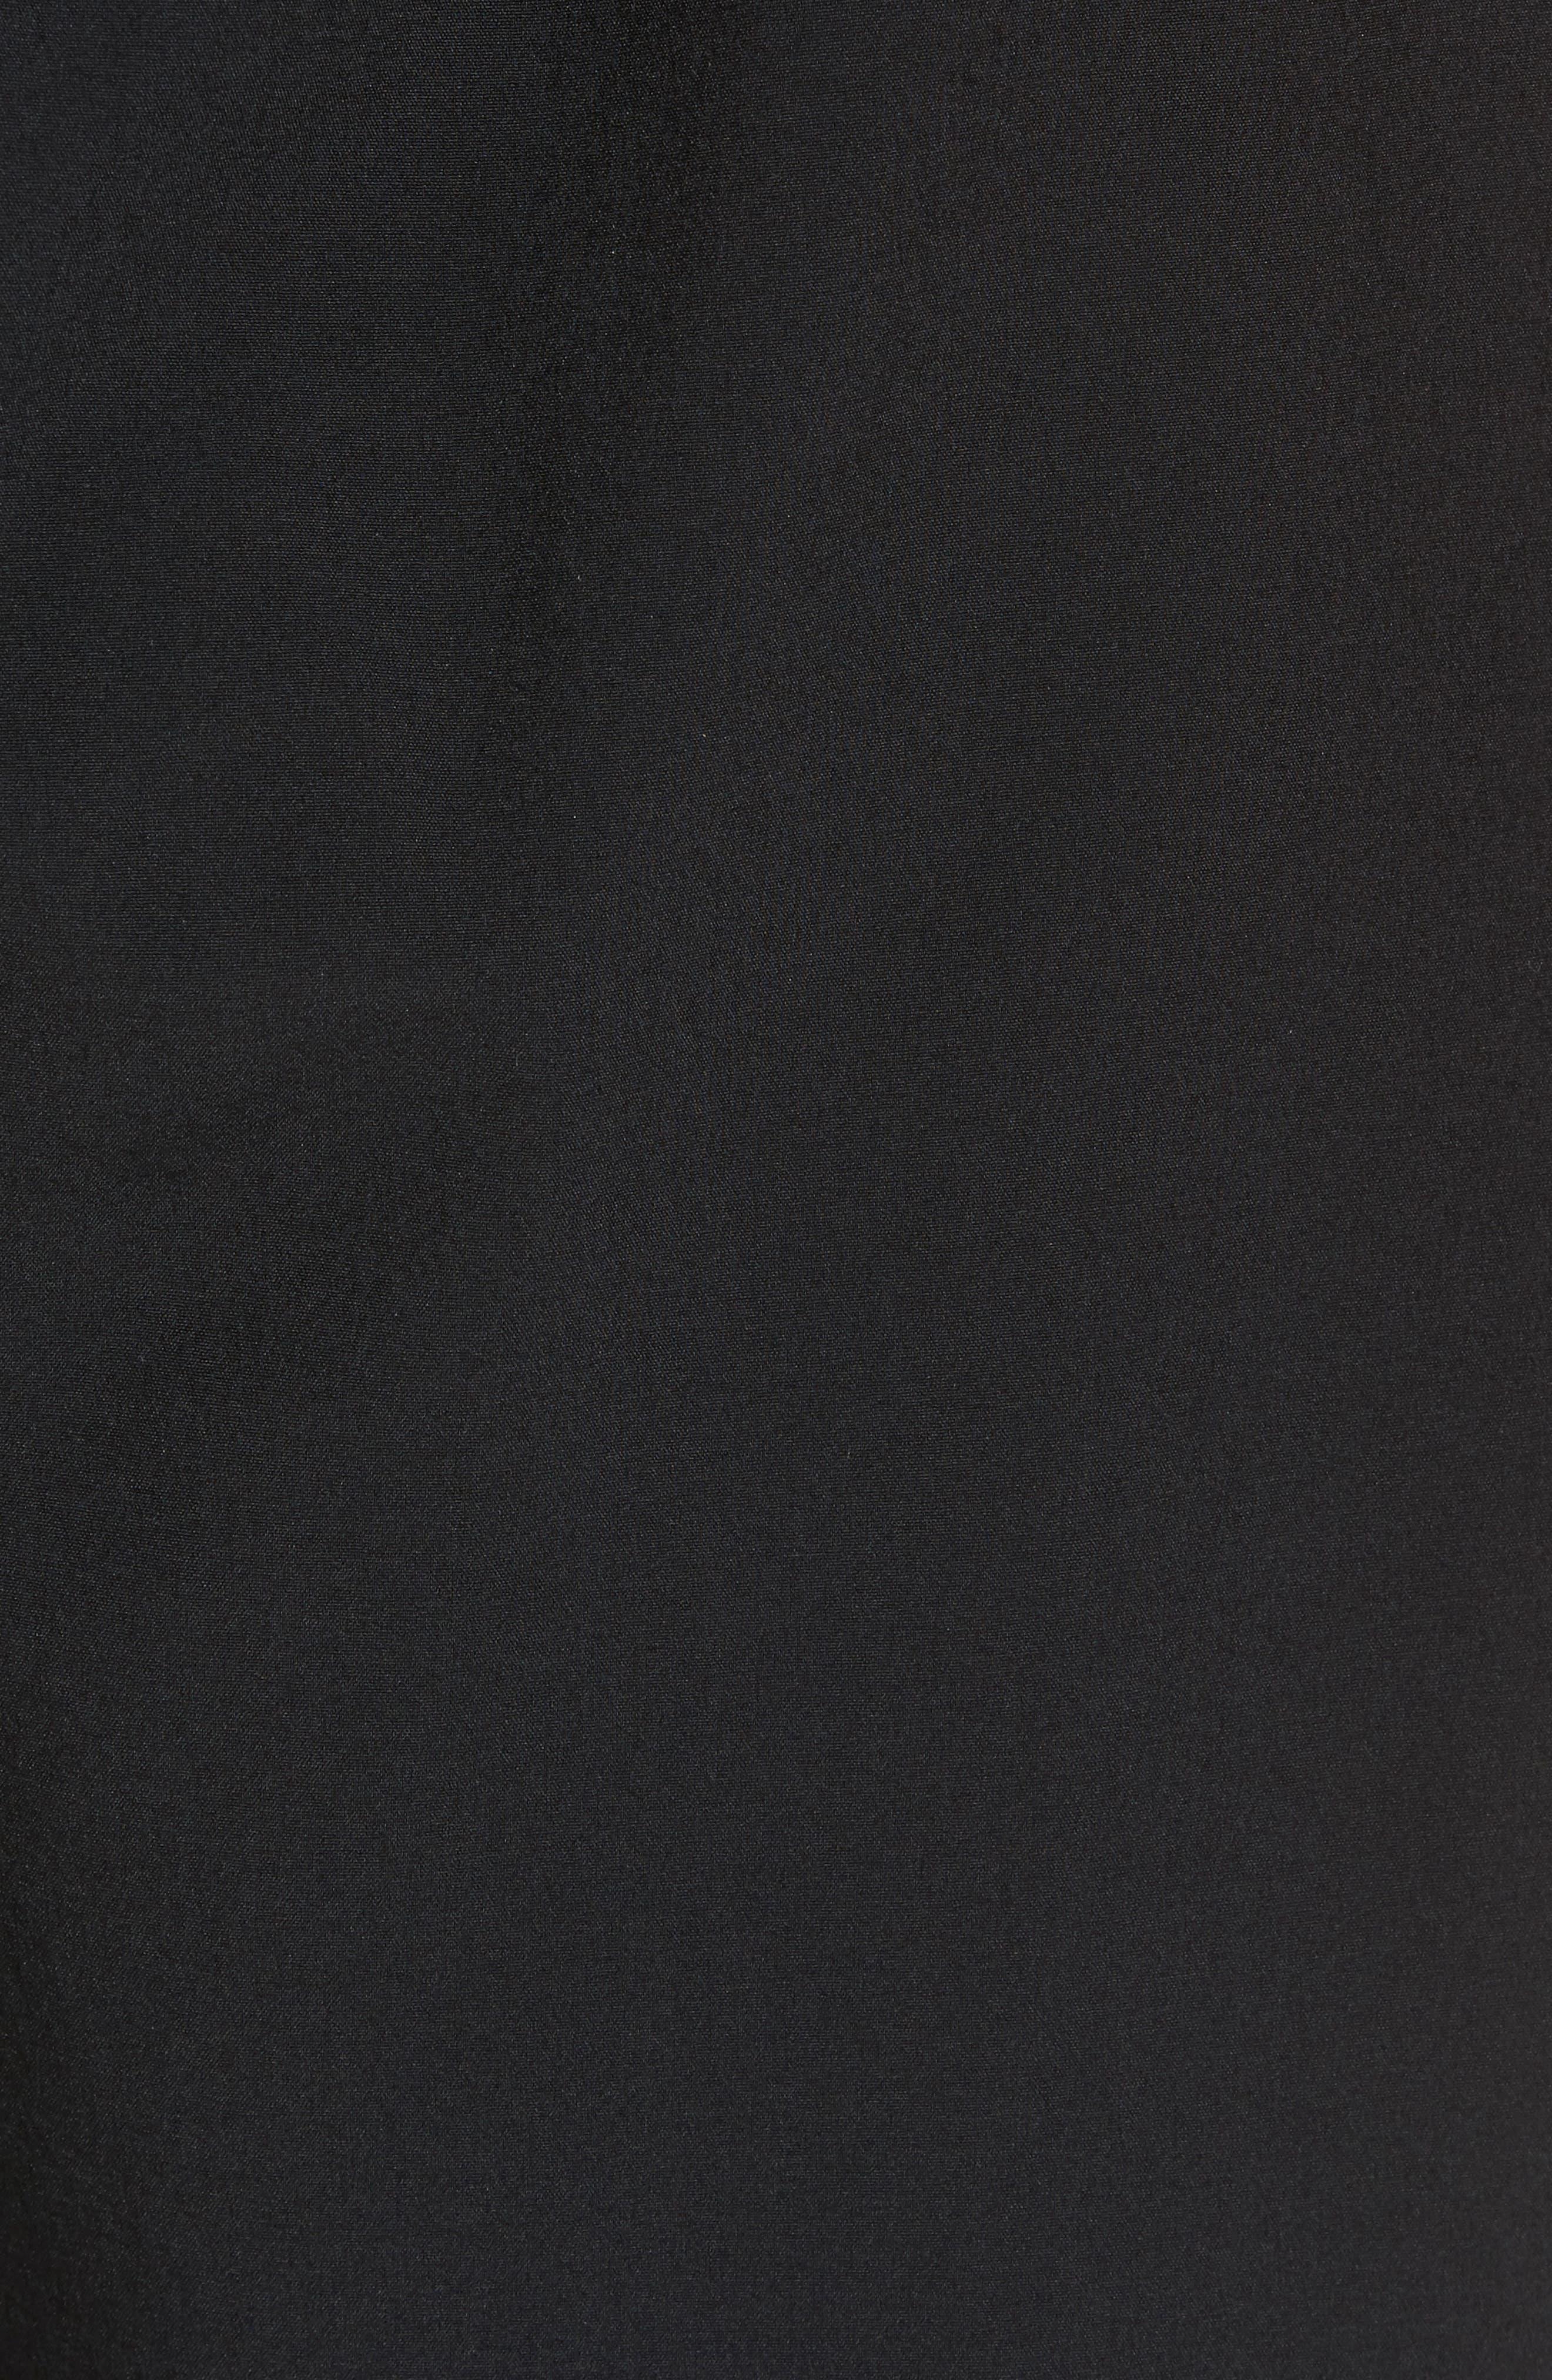 Flex Training Shorts,                             Alternate thumbnail 5, color,                             Black/ Cool Grey